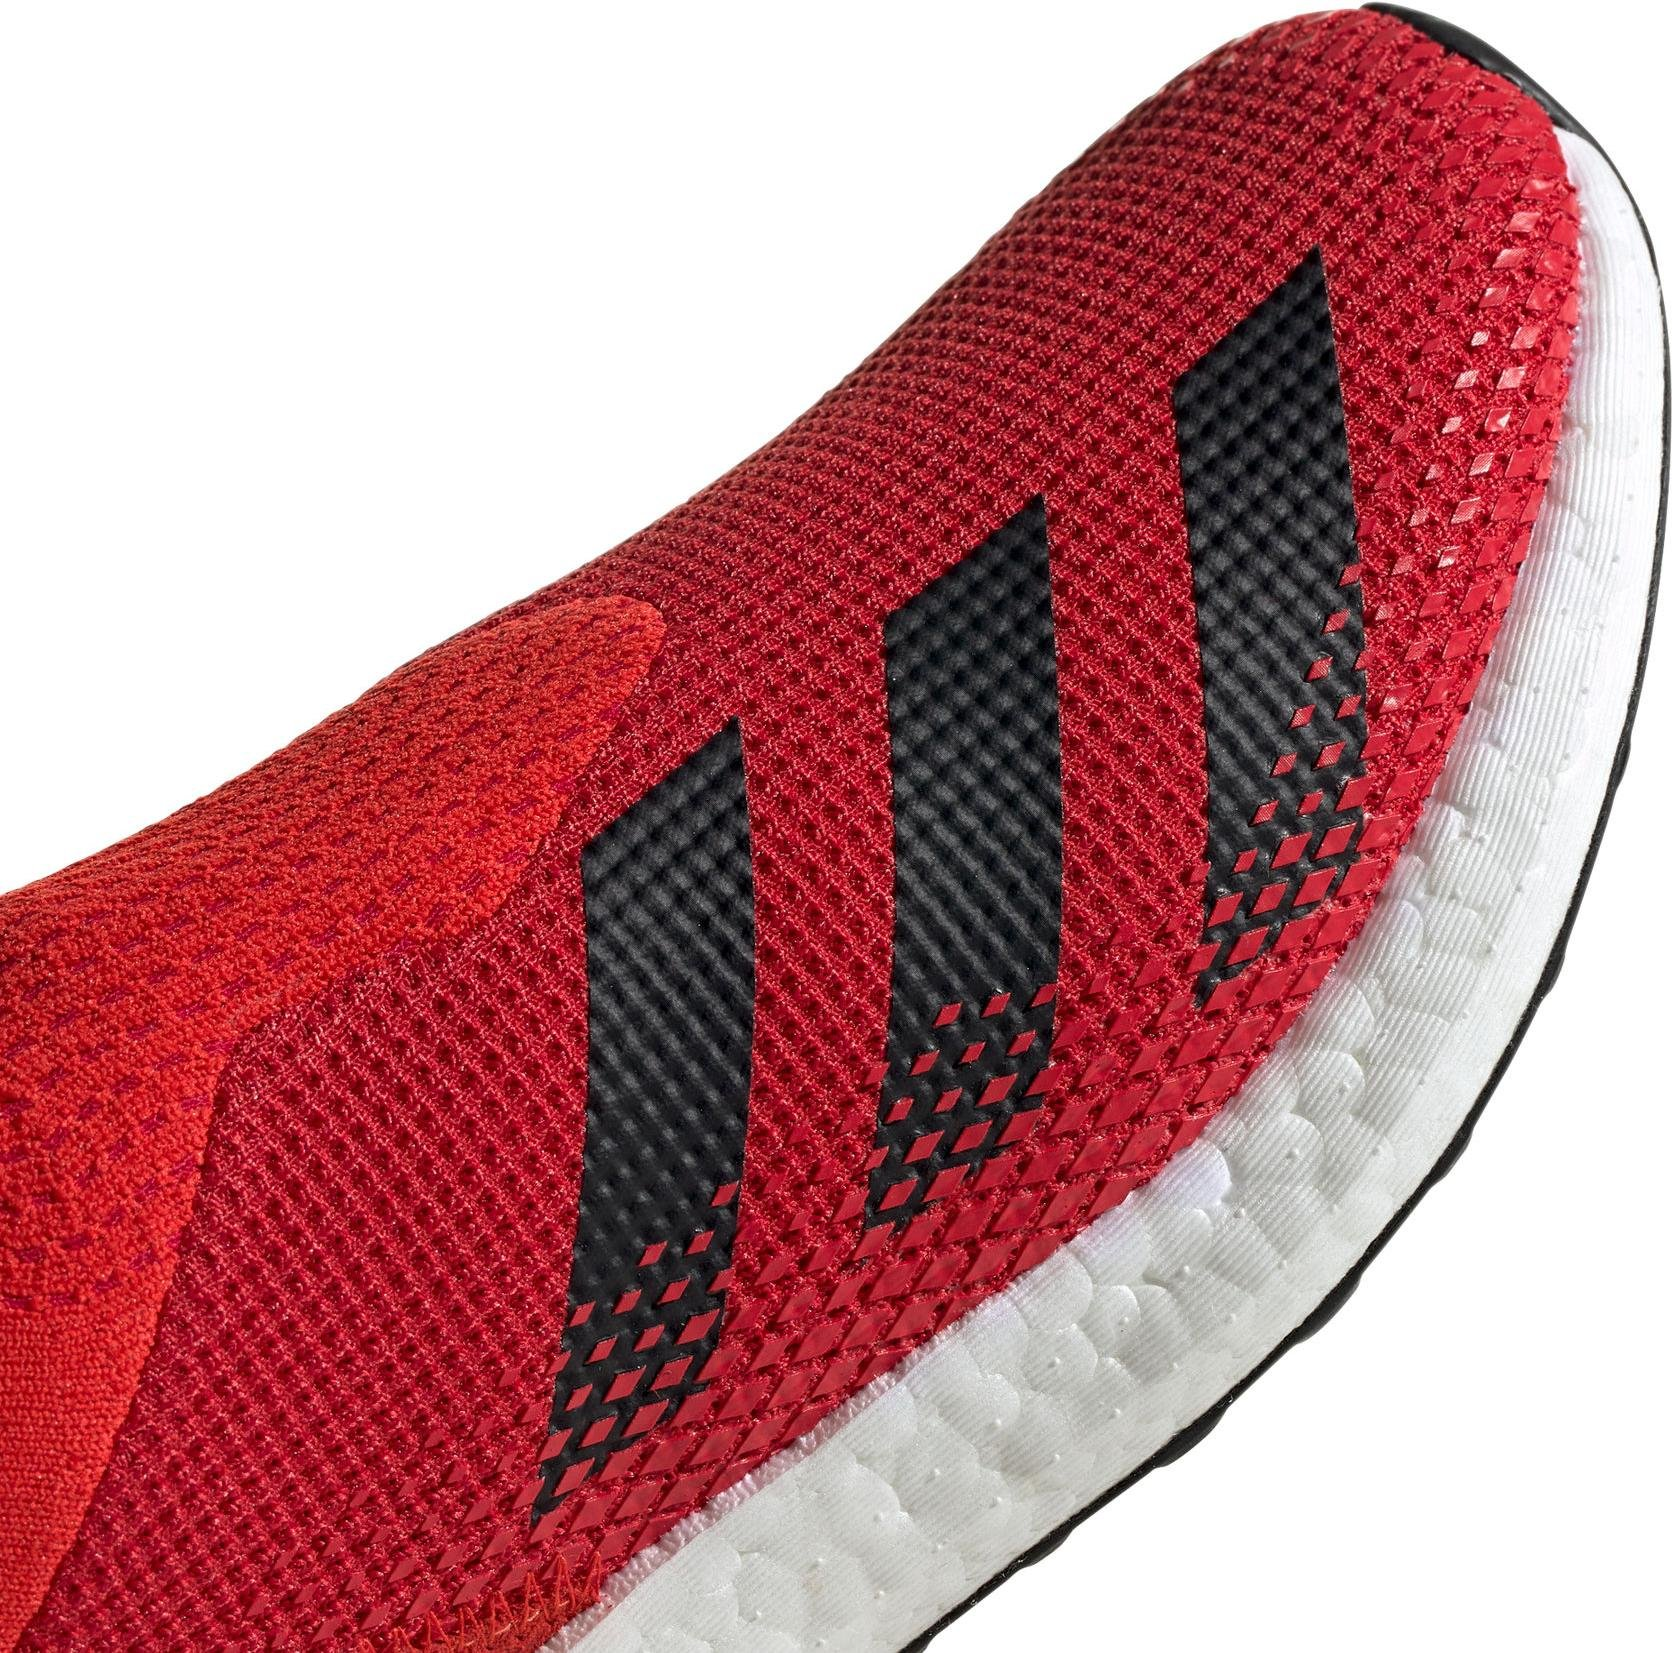 Schuhe adidas PREDATOR 20.1 TR Top4Running.at